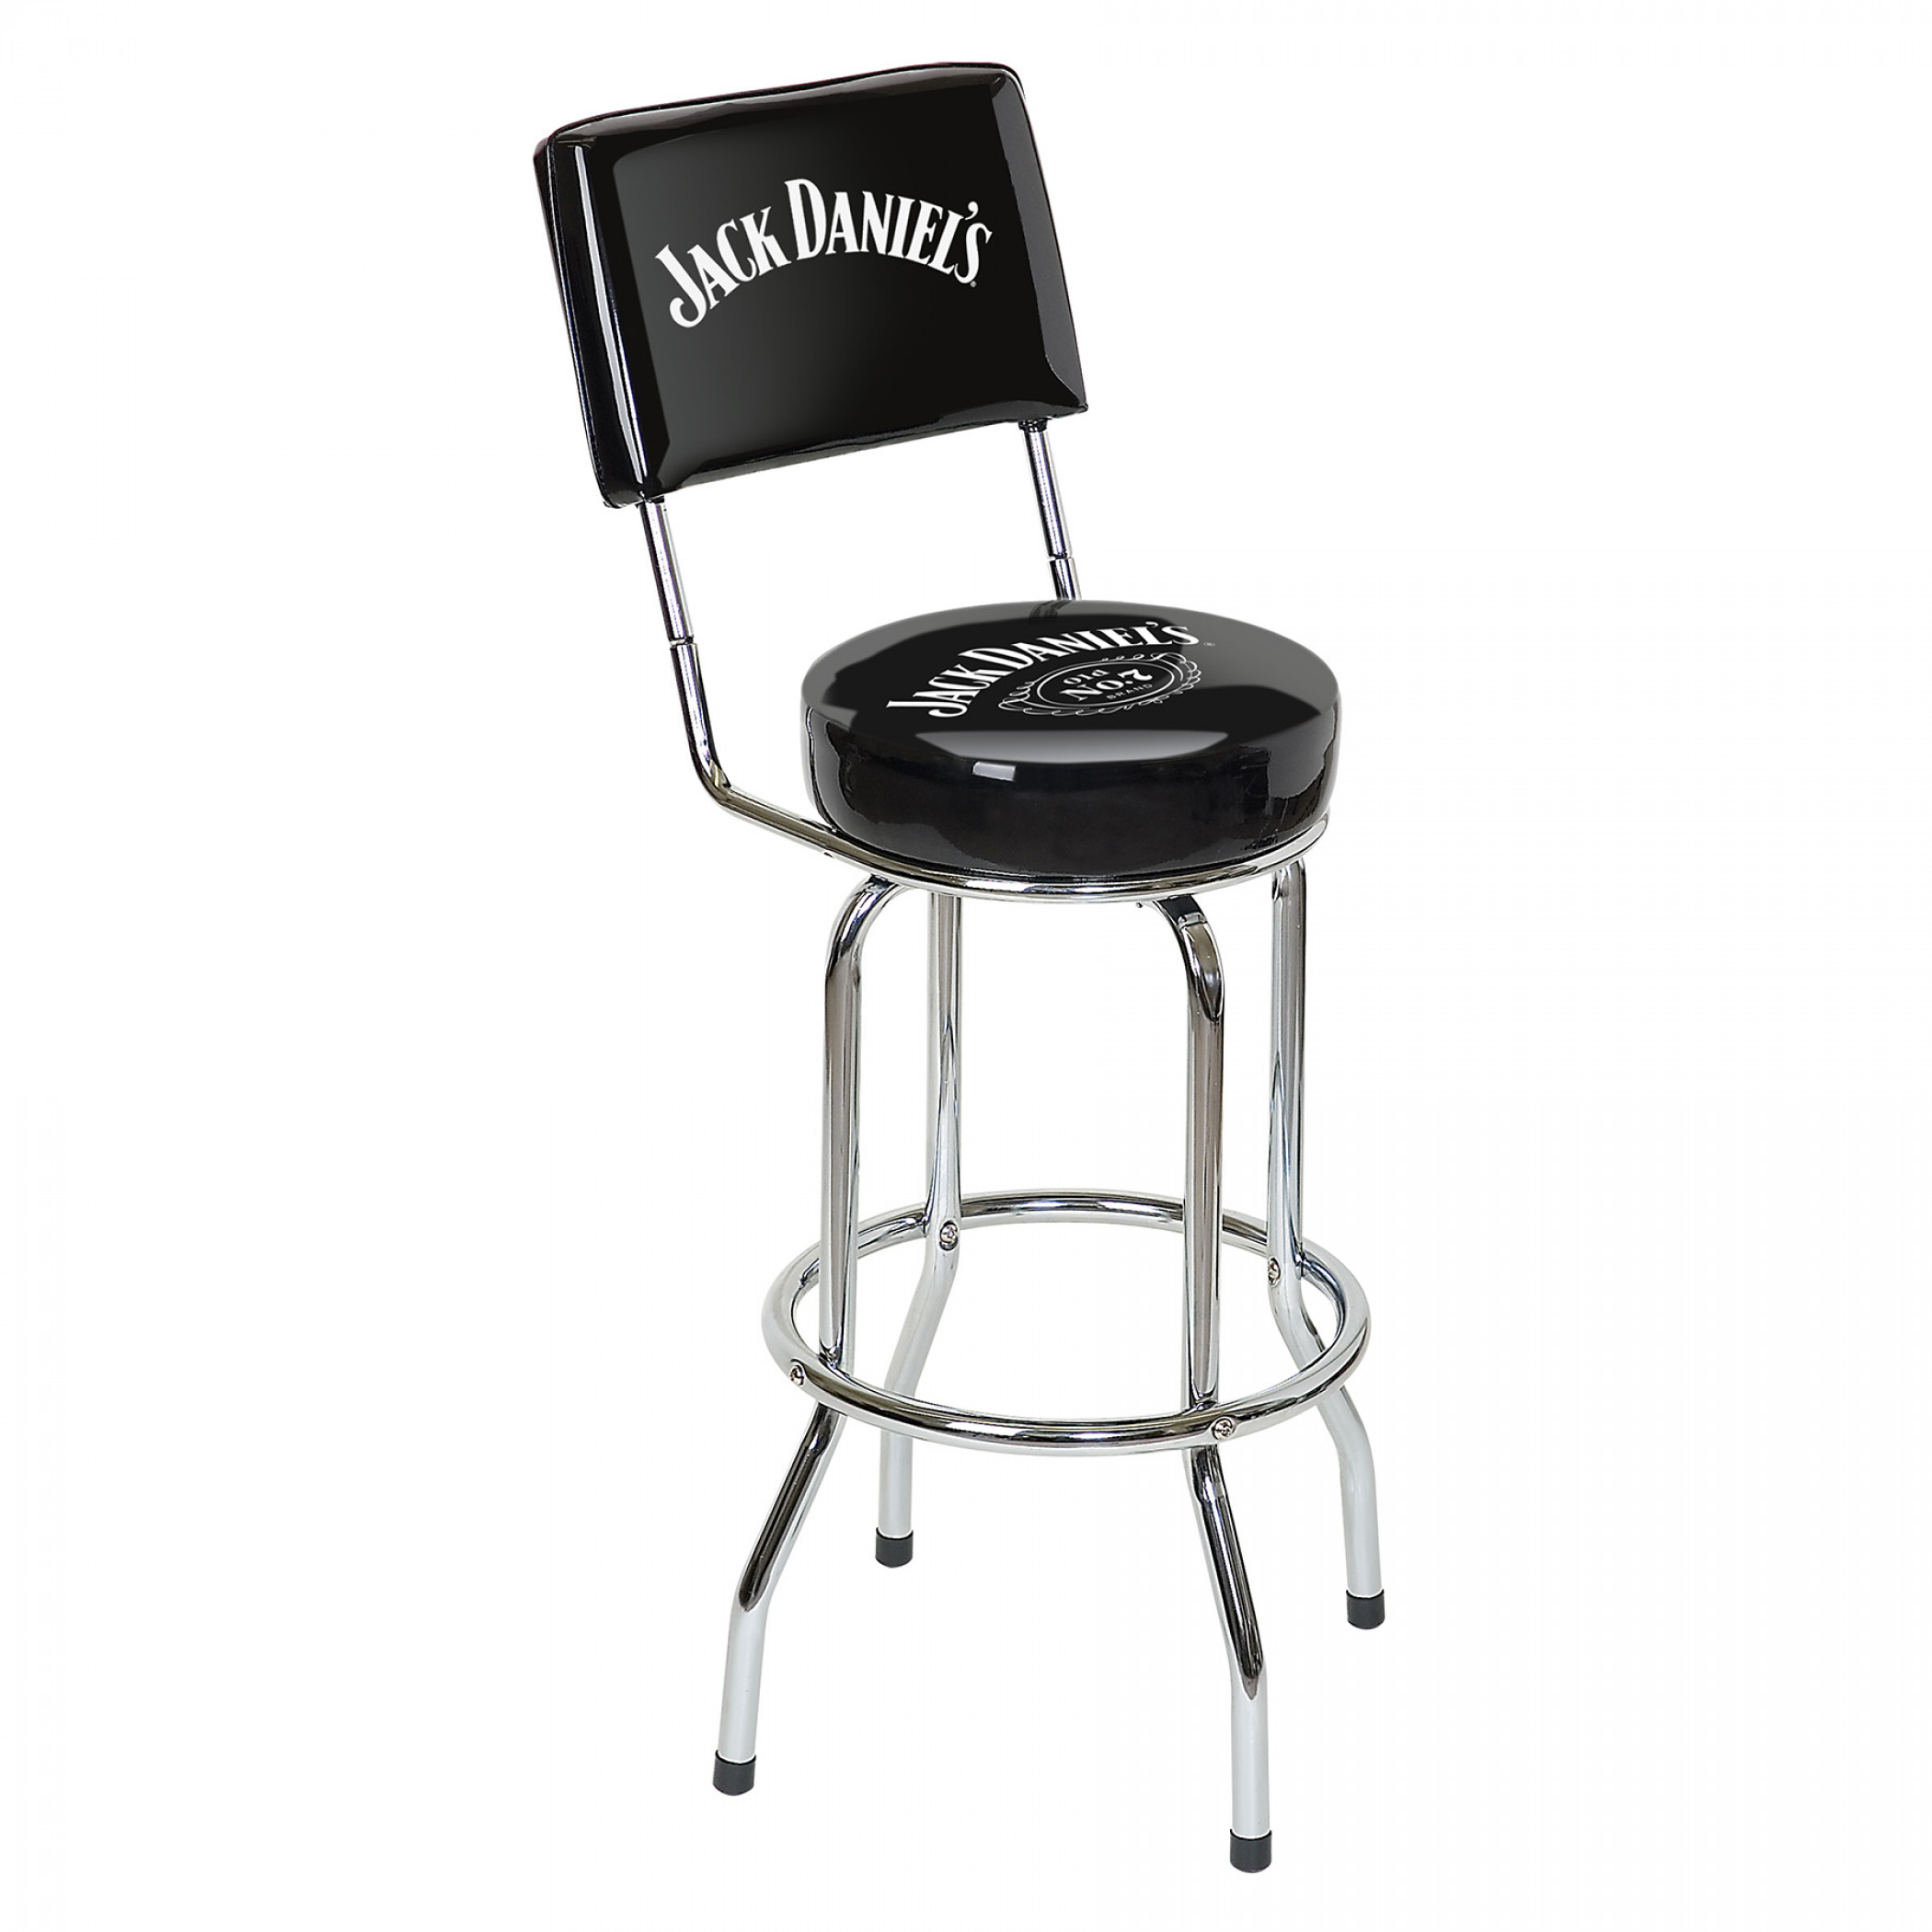 Jack Daniels Old No. 7 Brand Bar Stools with Backrest